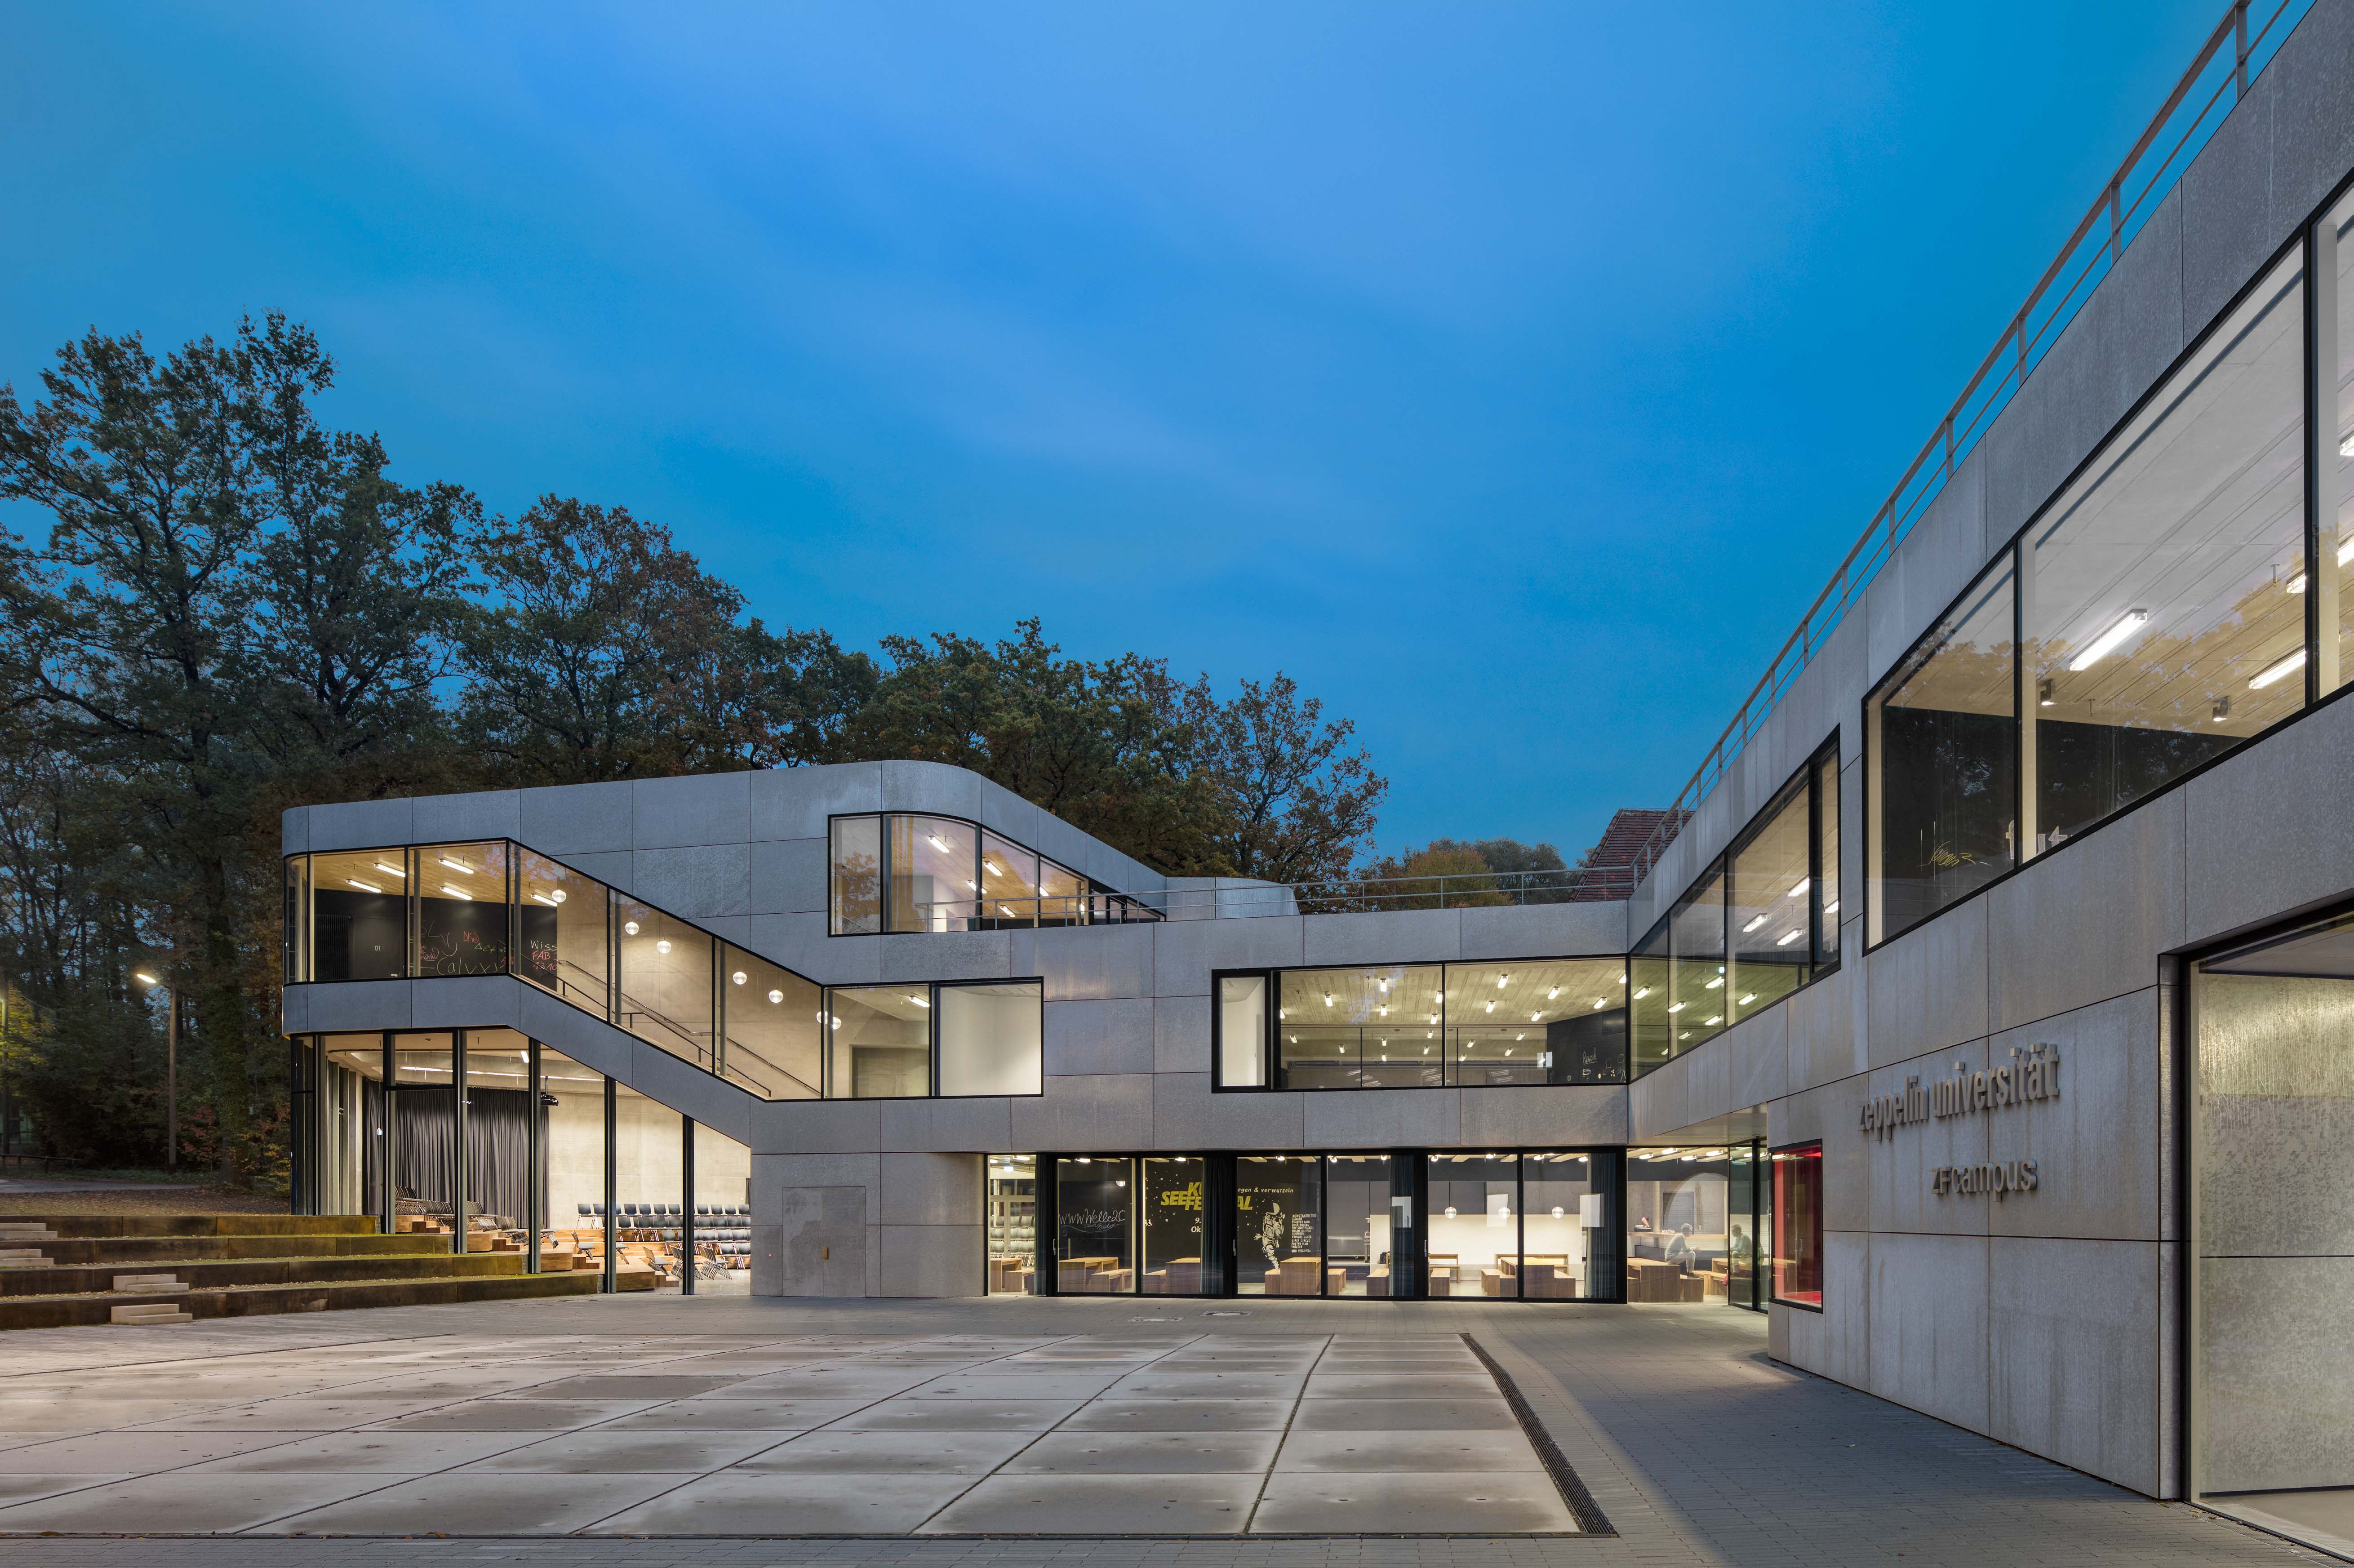 Detailseite for Uni architektur